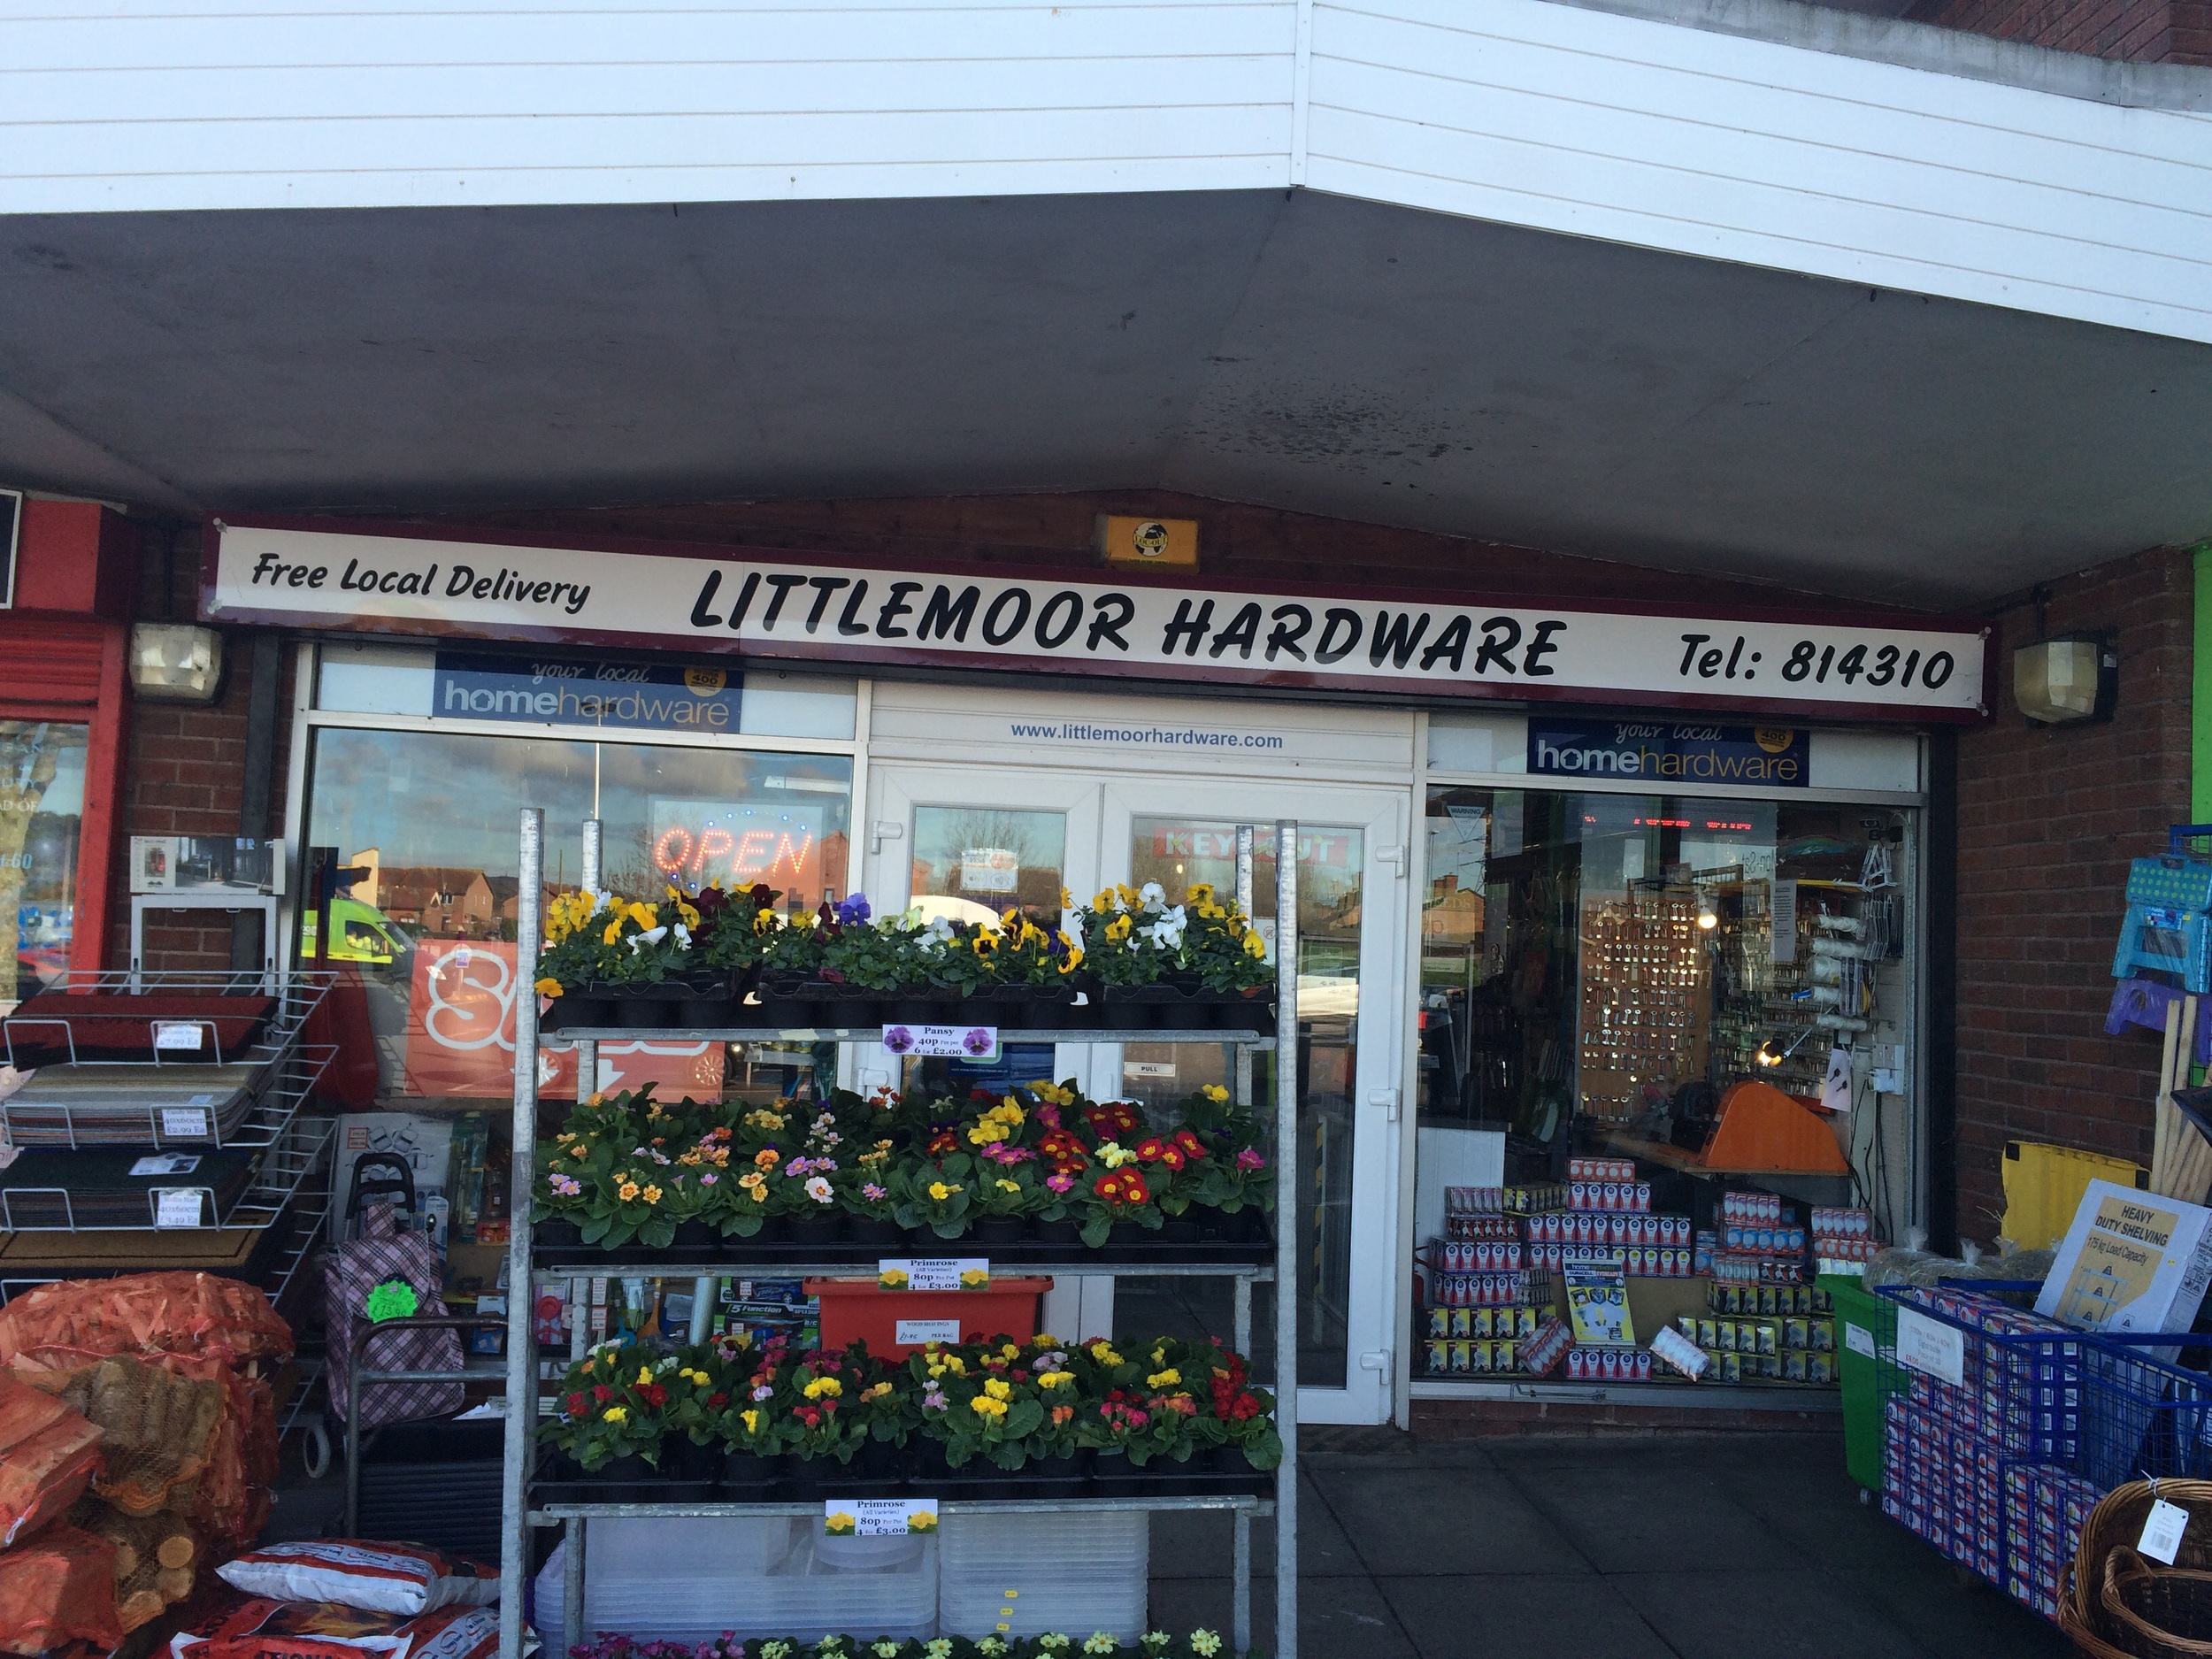 Littlemoor hardware.